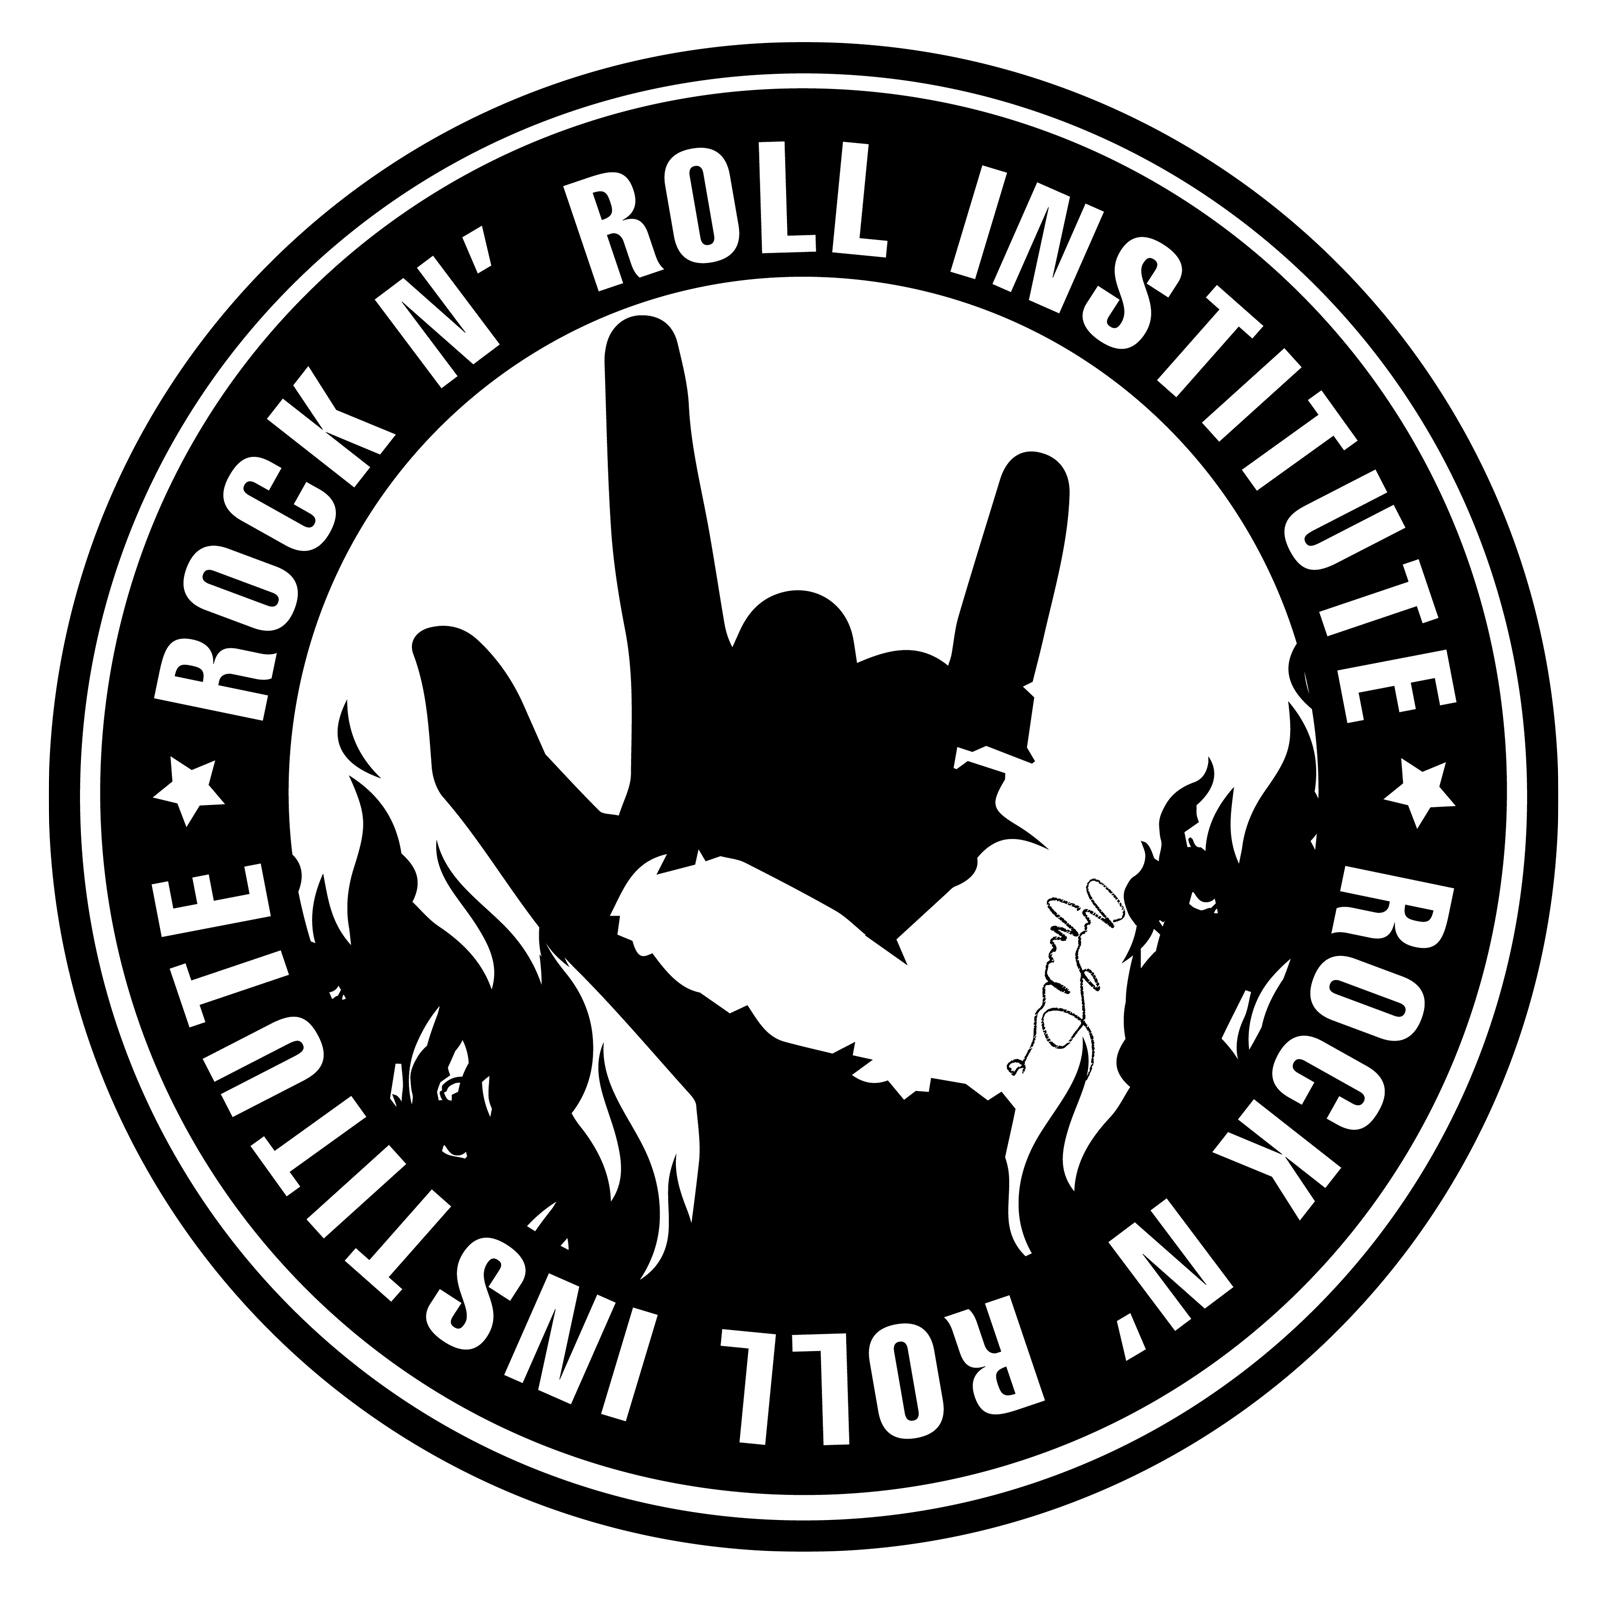 Rock n roll institute buycottarizona